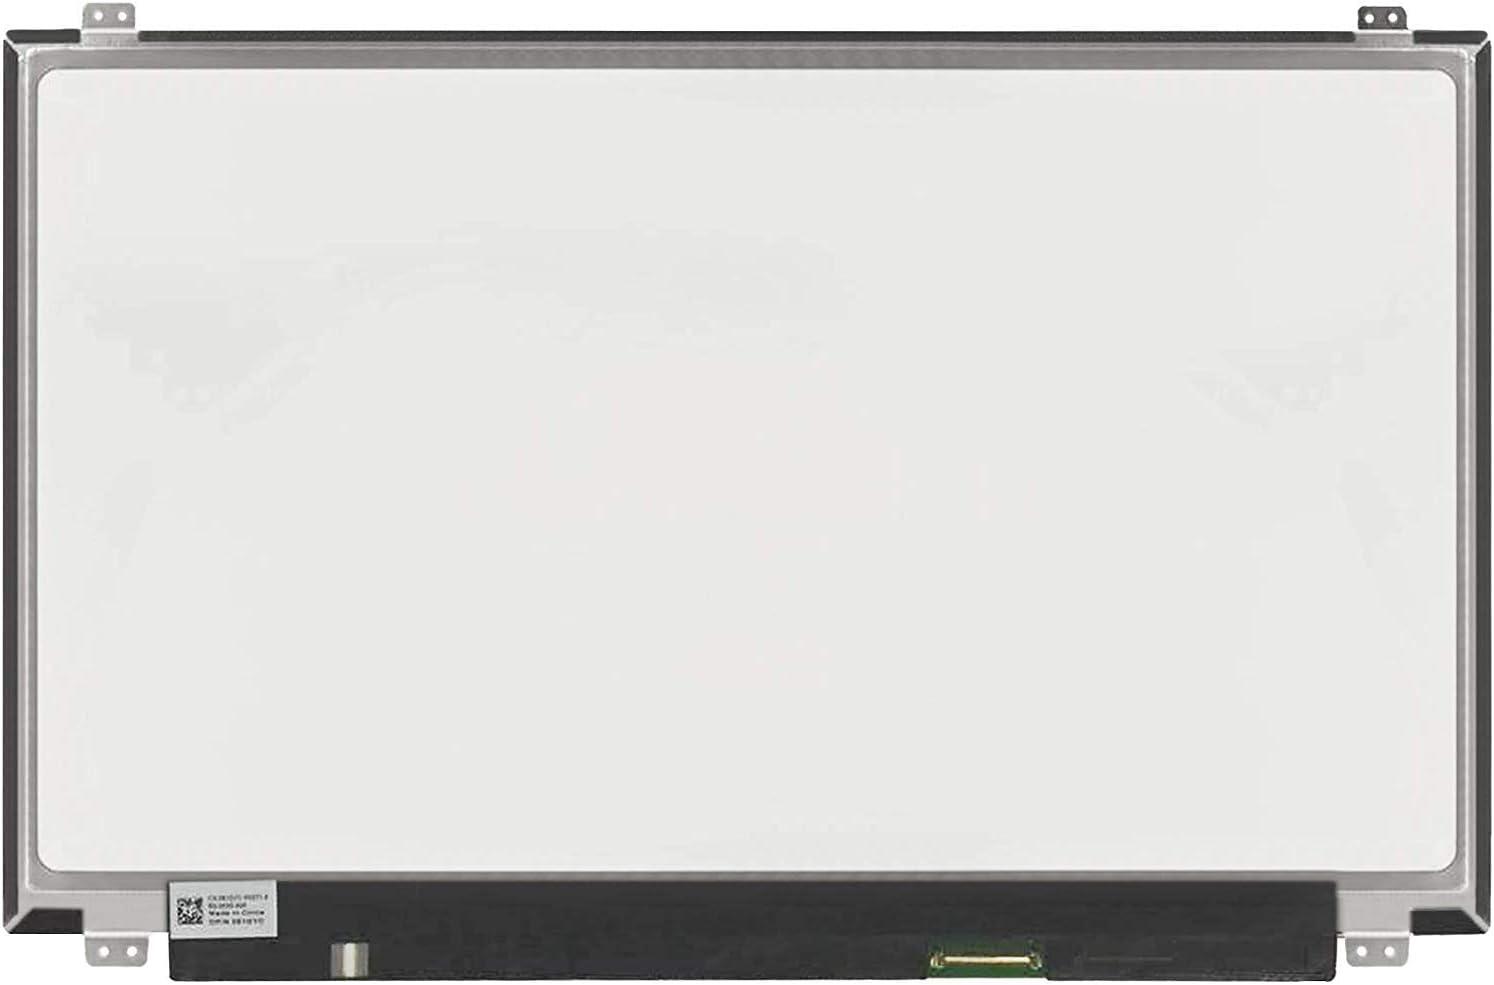 "Laptop LCD Screen 15.6"" LED Display Screen Panel 4k 3840X2160 40 Pin eDP LTN156FL02-L01 LTN156FL01-D01 for Lenovo Y50"